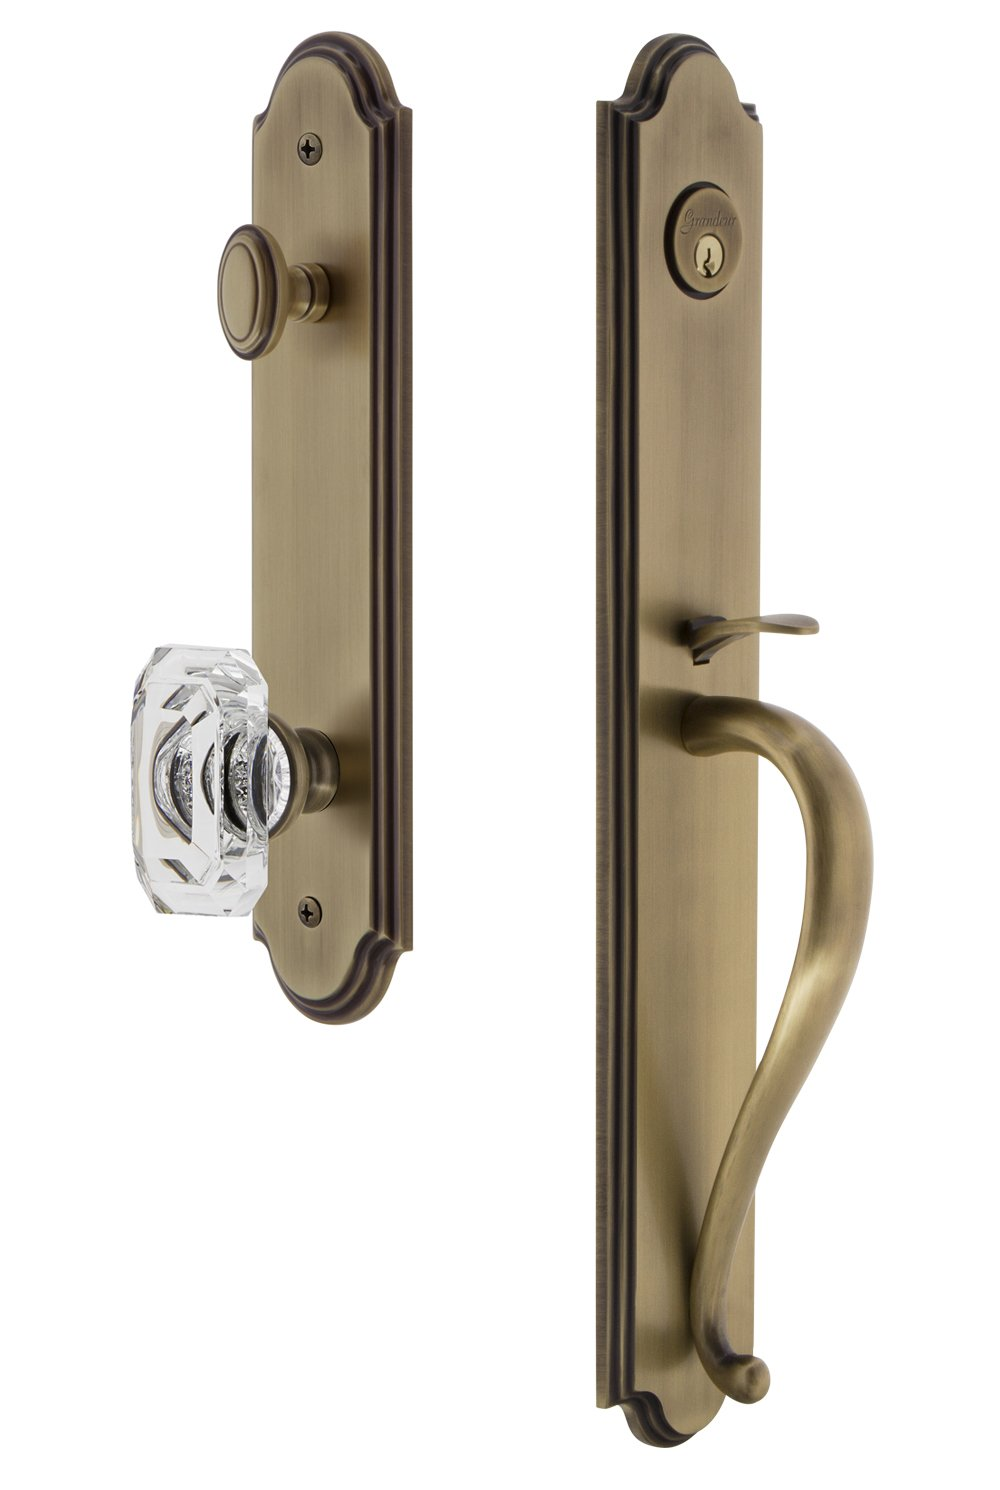 Lot of 10 Dummy Satin Nickel Round Knob Handle Door No Lock Pull